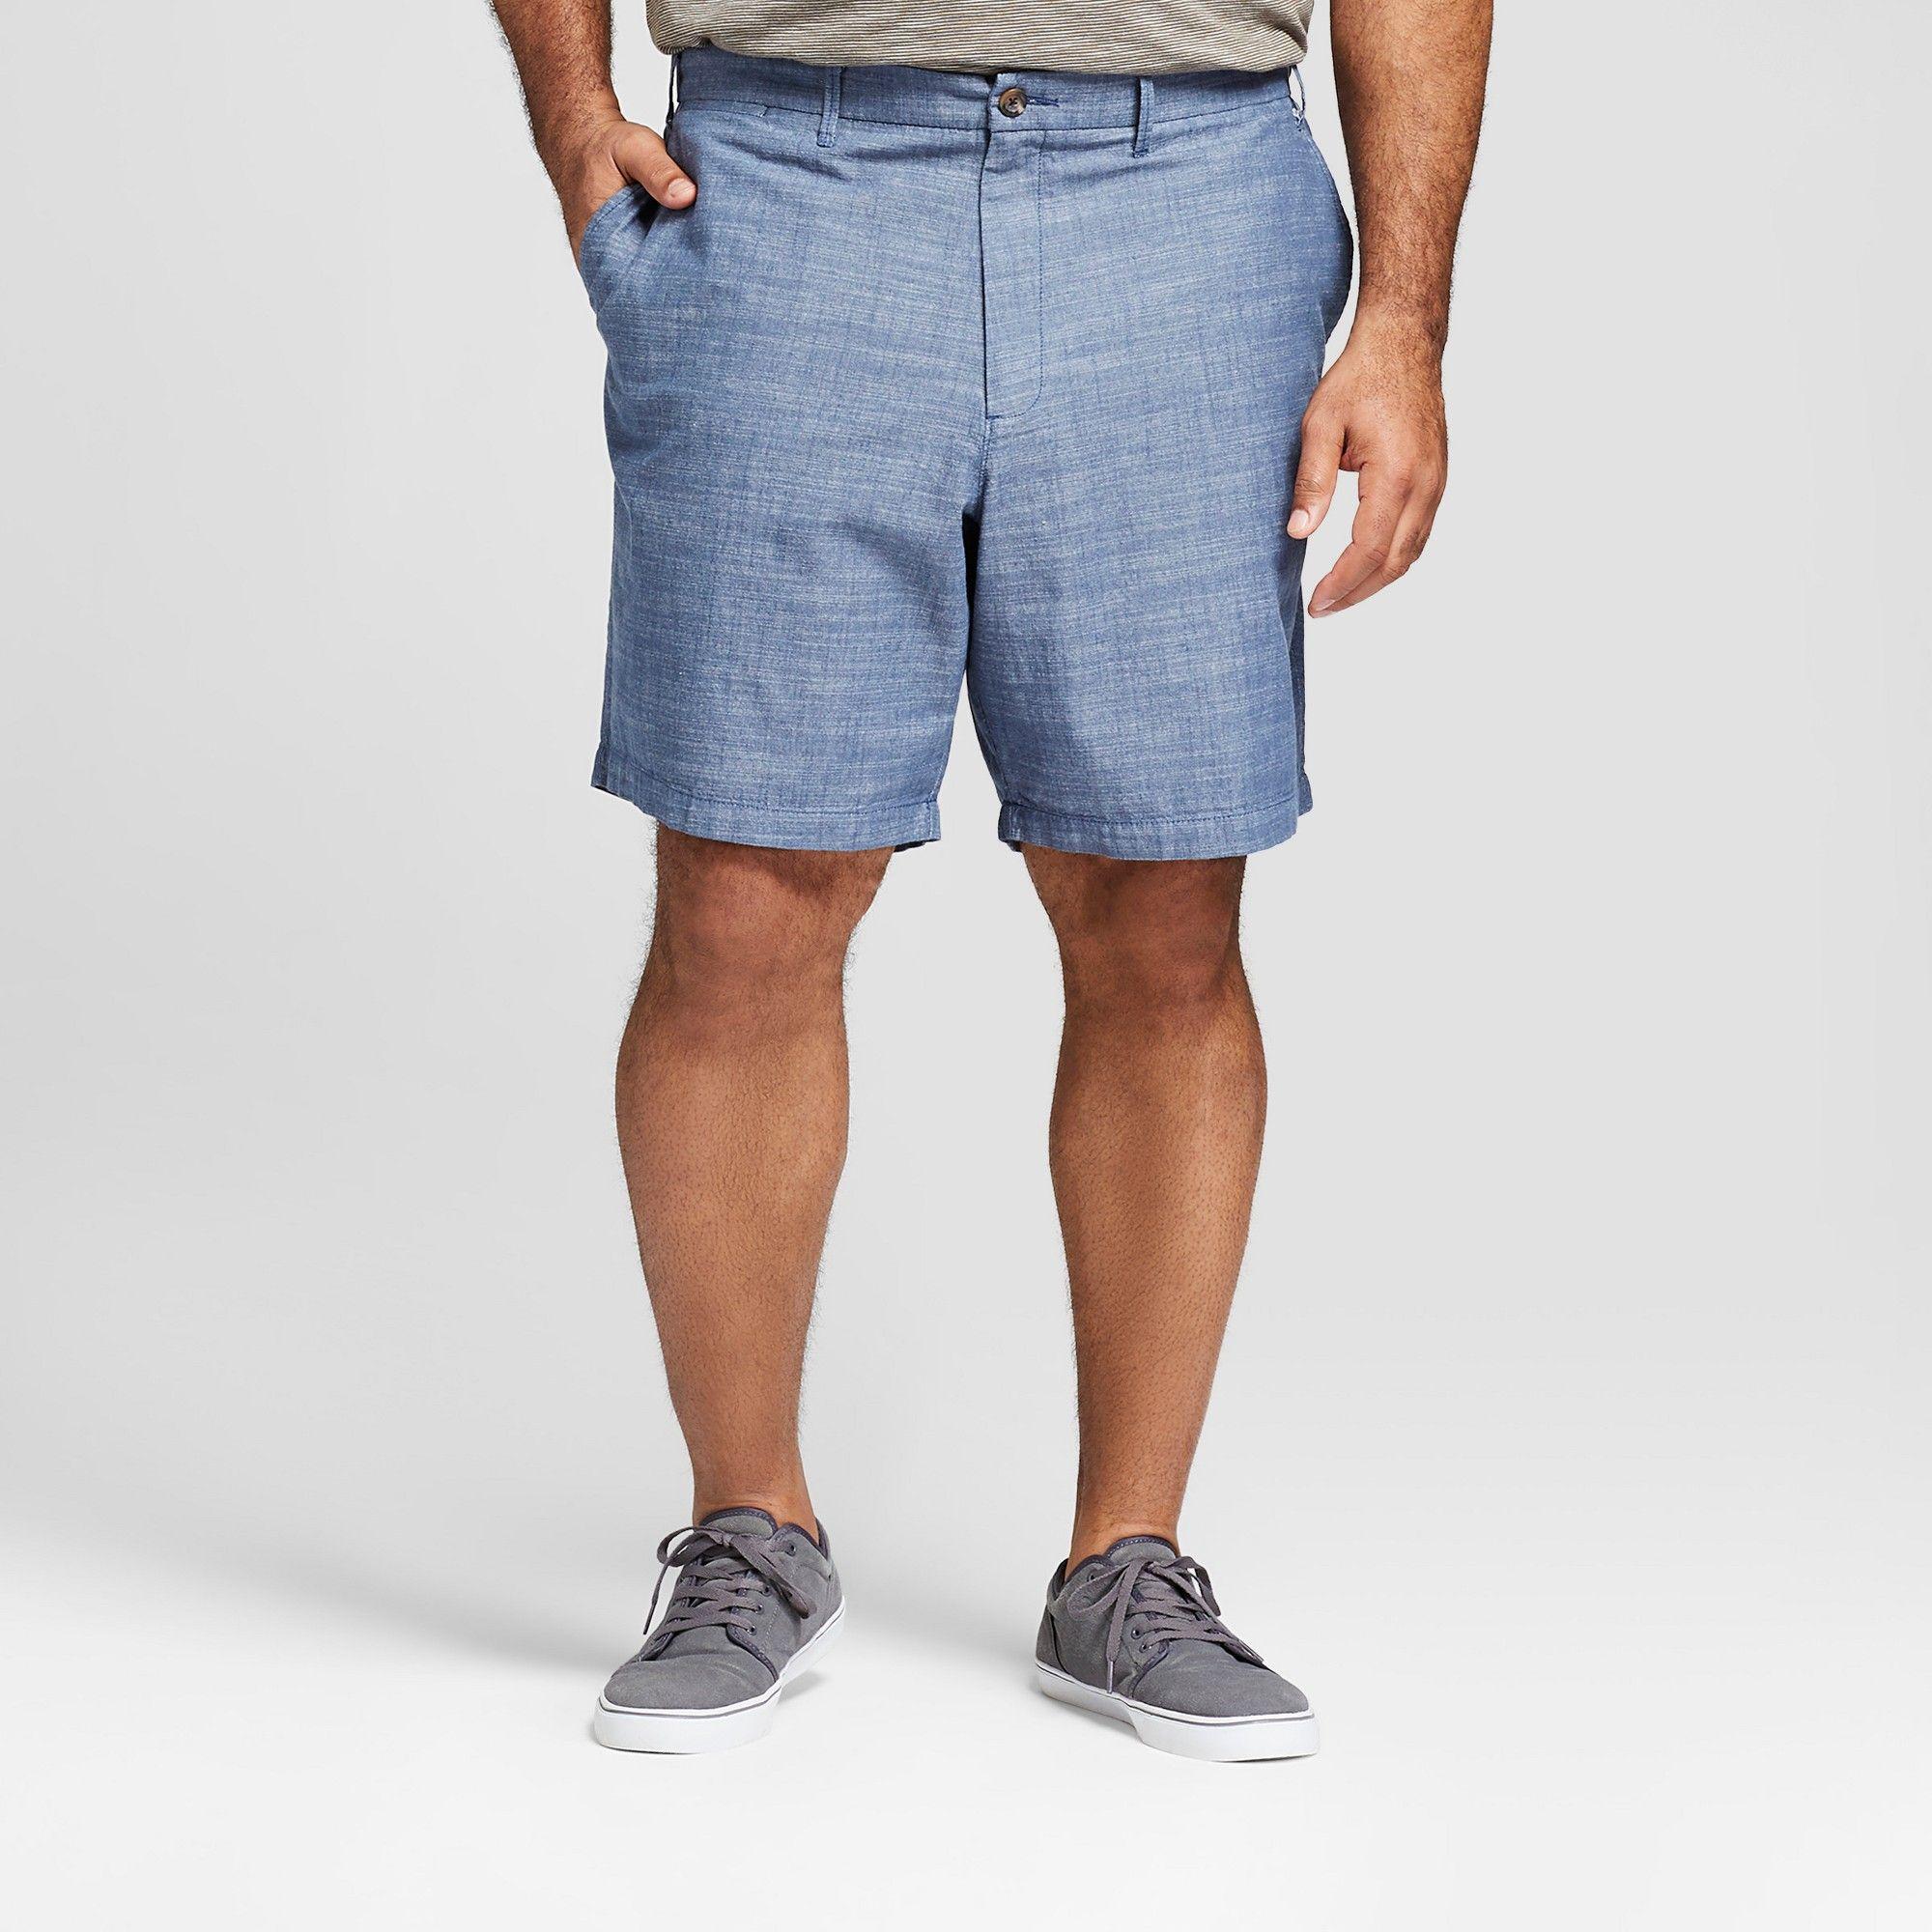 b40197a473 Men's Big & Tall 10.5 Chambray Linden Flat Front Shorts - Goodfellow & Co  Blue Chambray 60